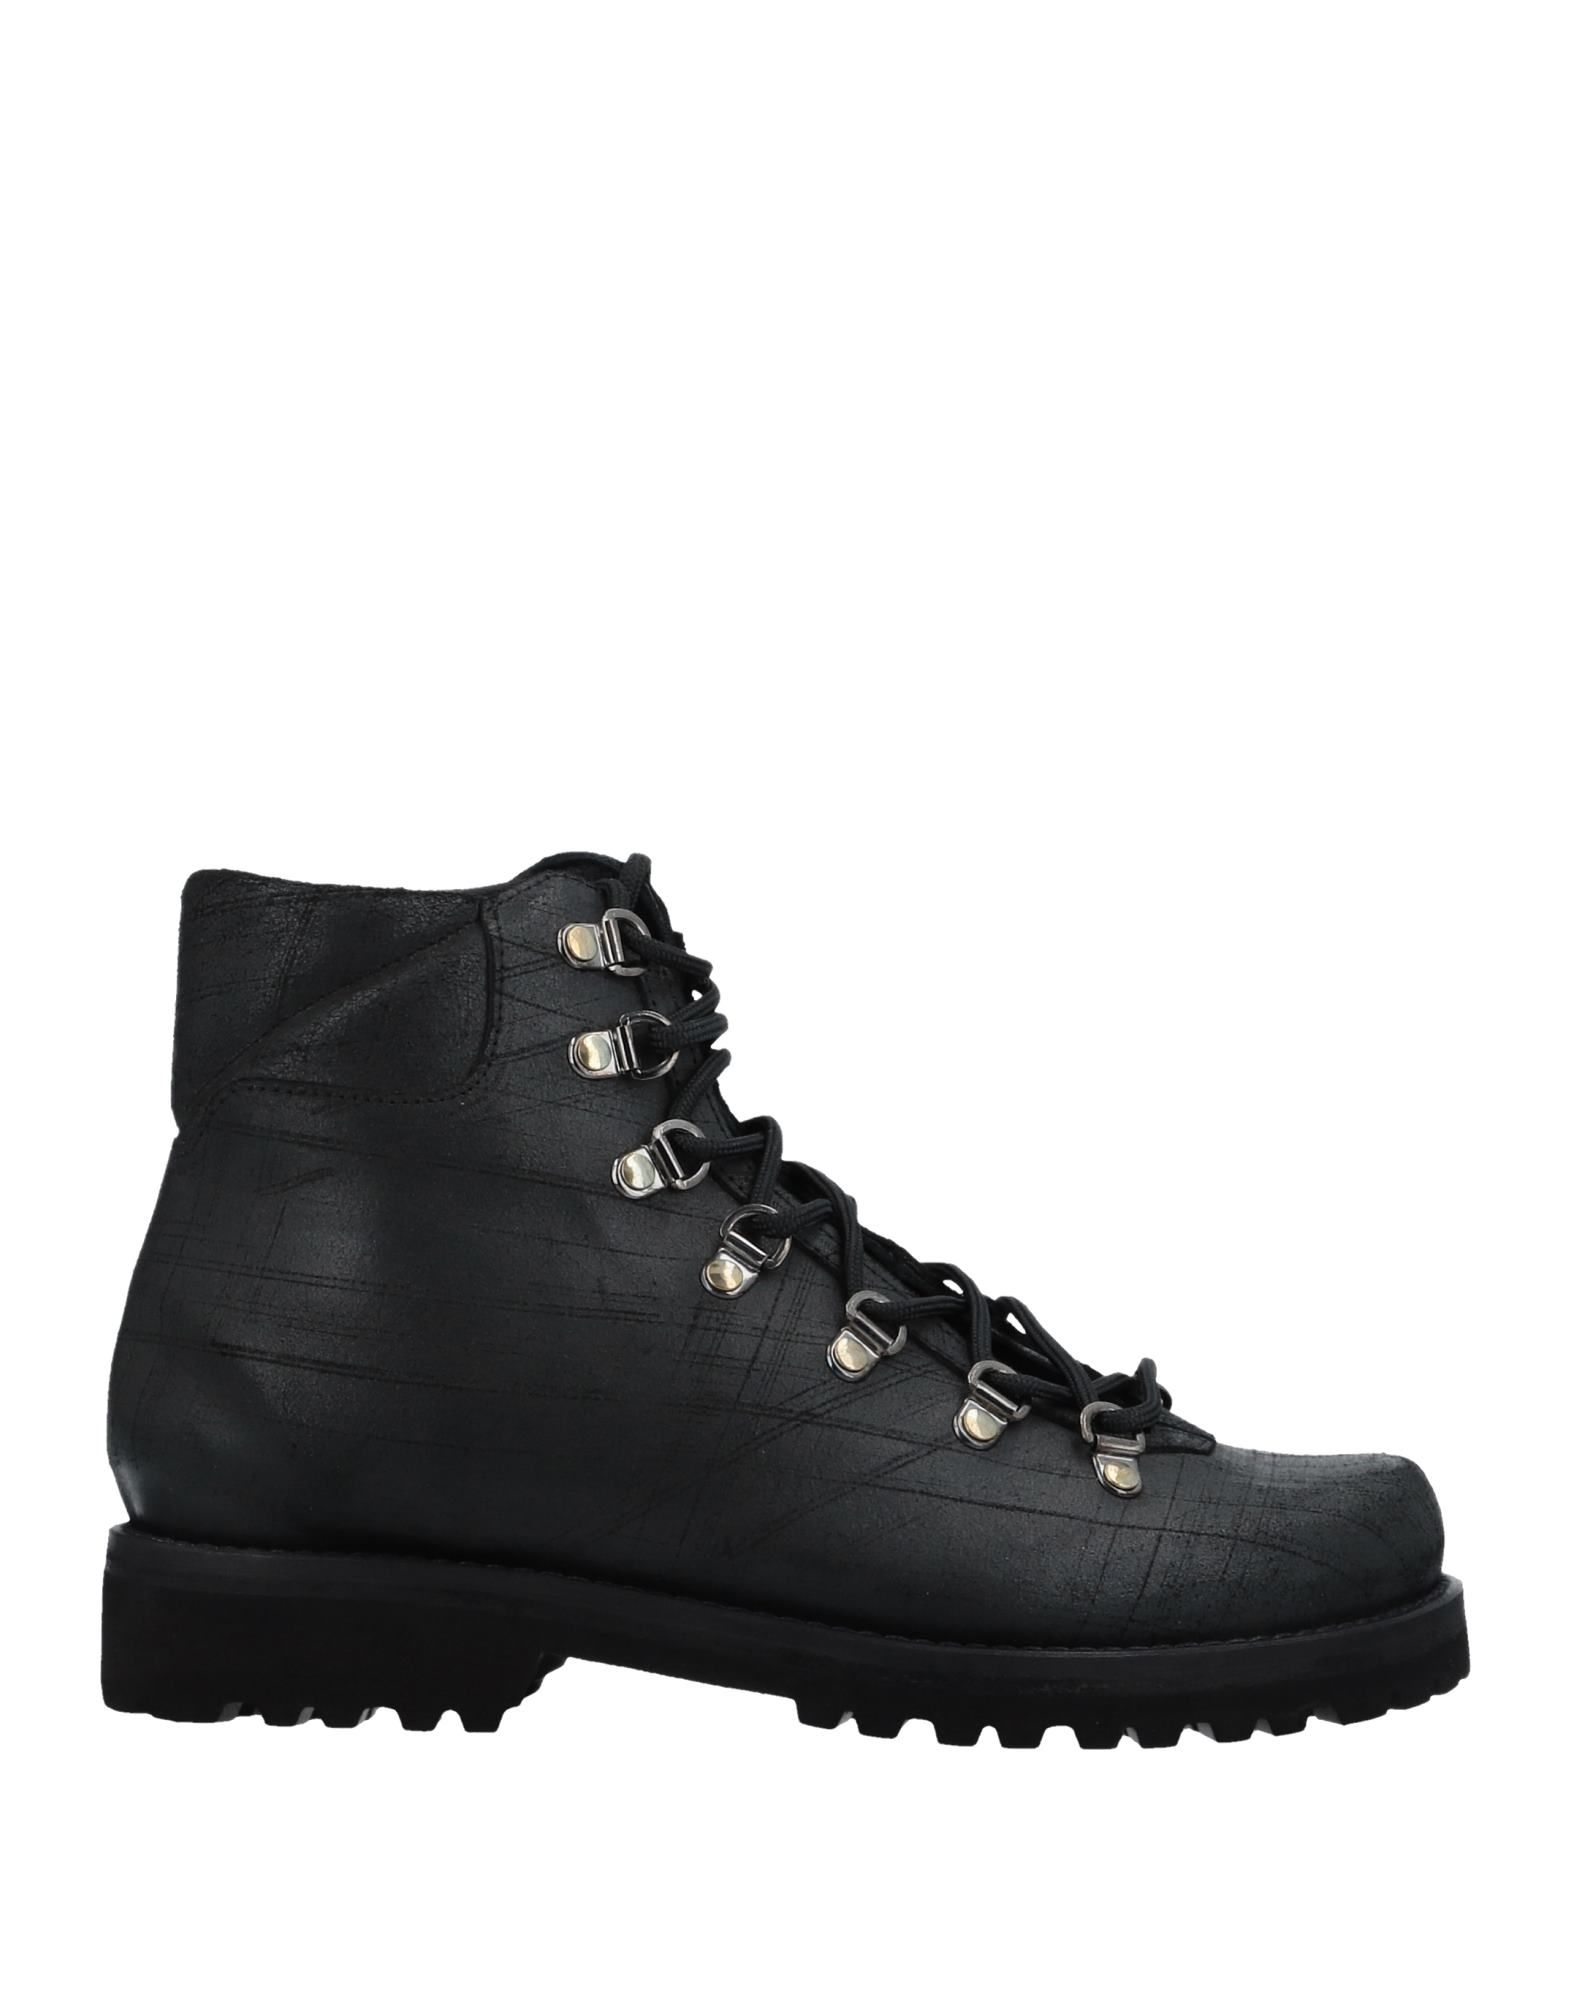 Rabatt Schuhe Peter Non Stiefelette Damen  11508868ST